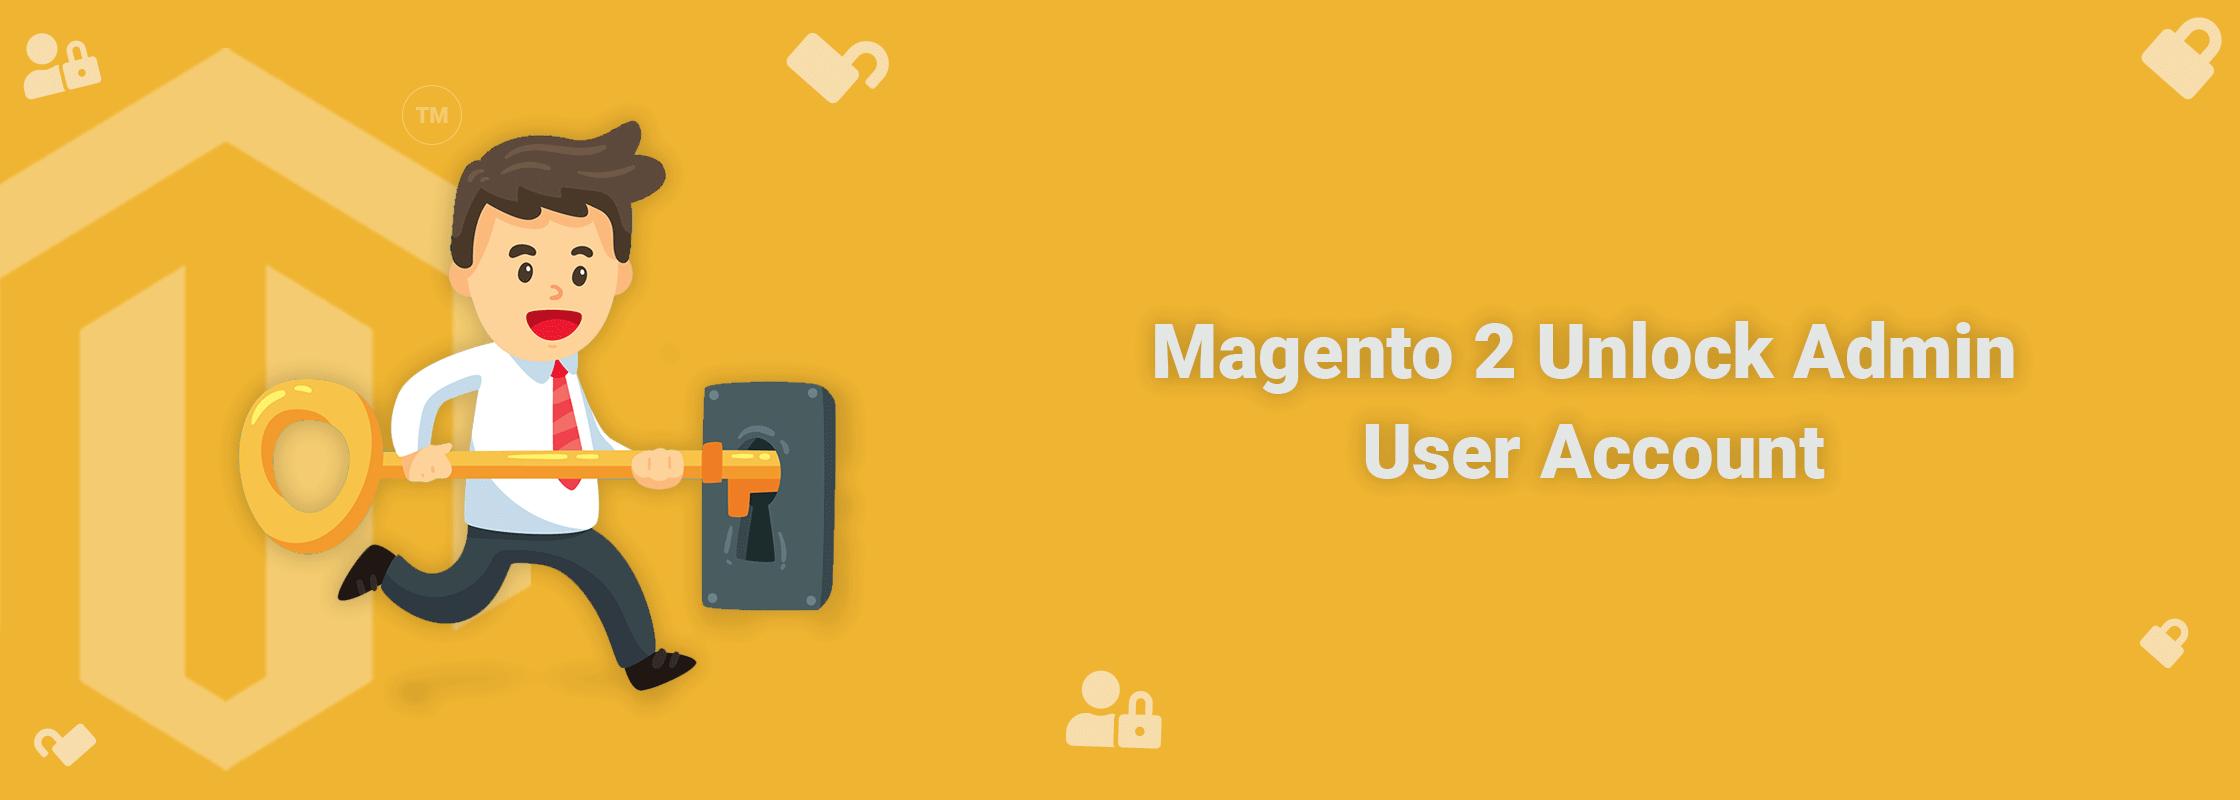 Magento 2 Unlock Admin User Account